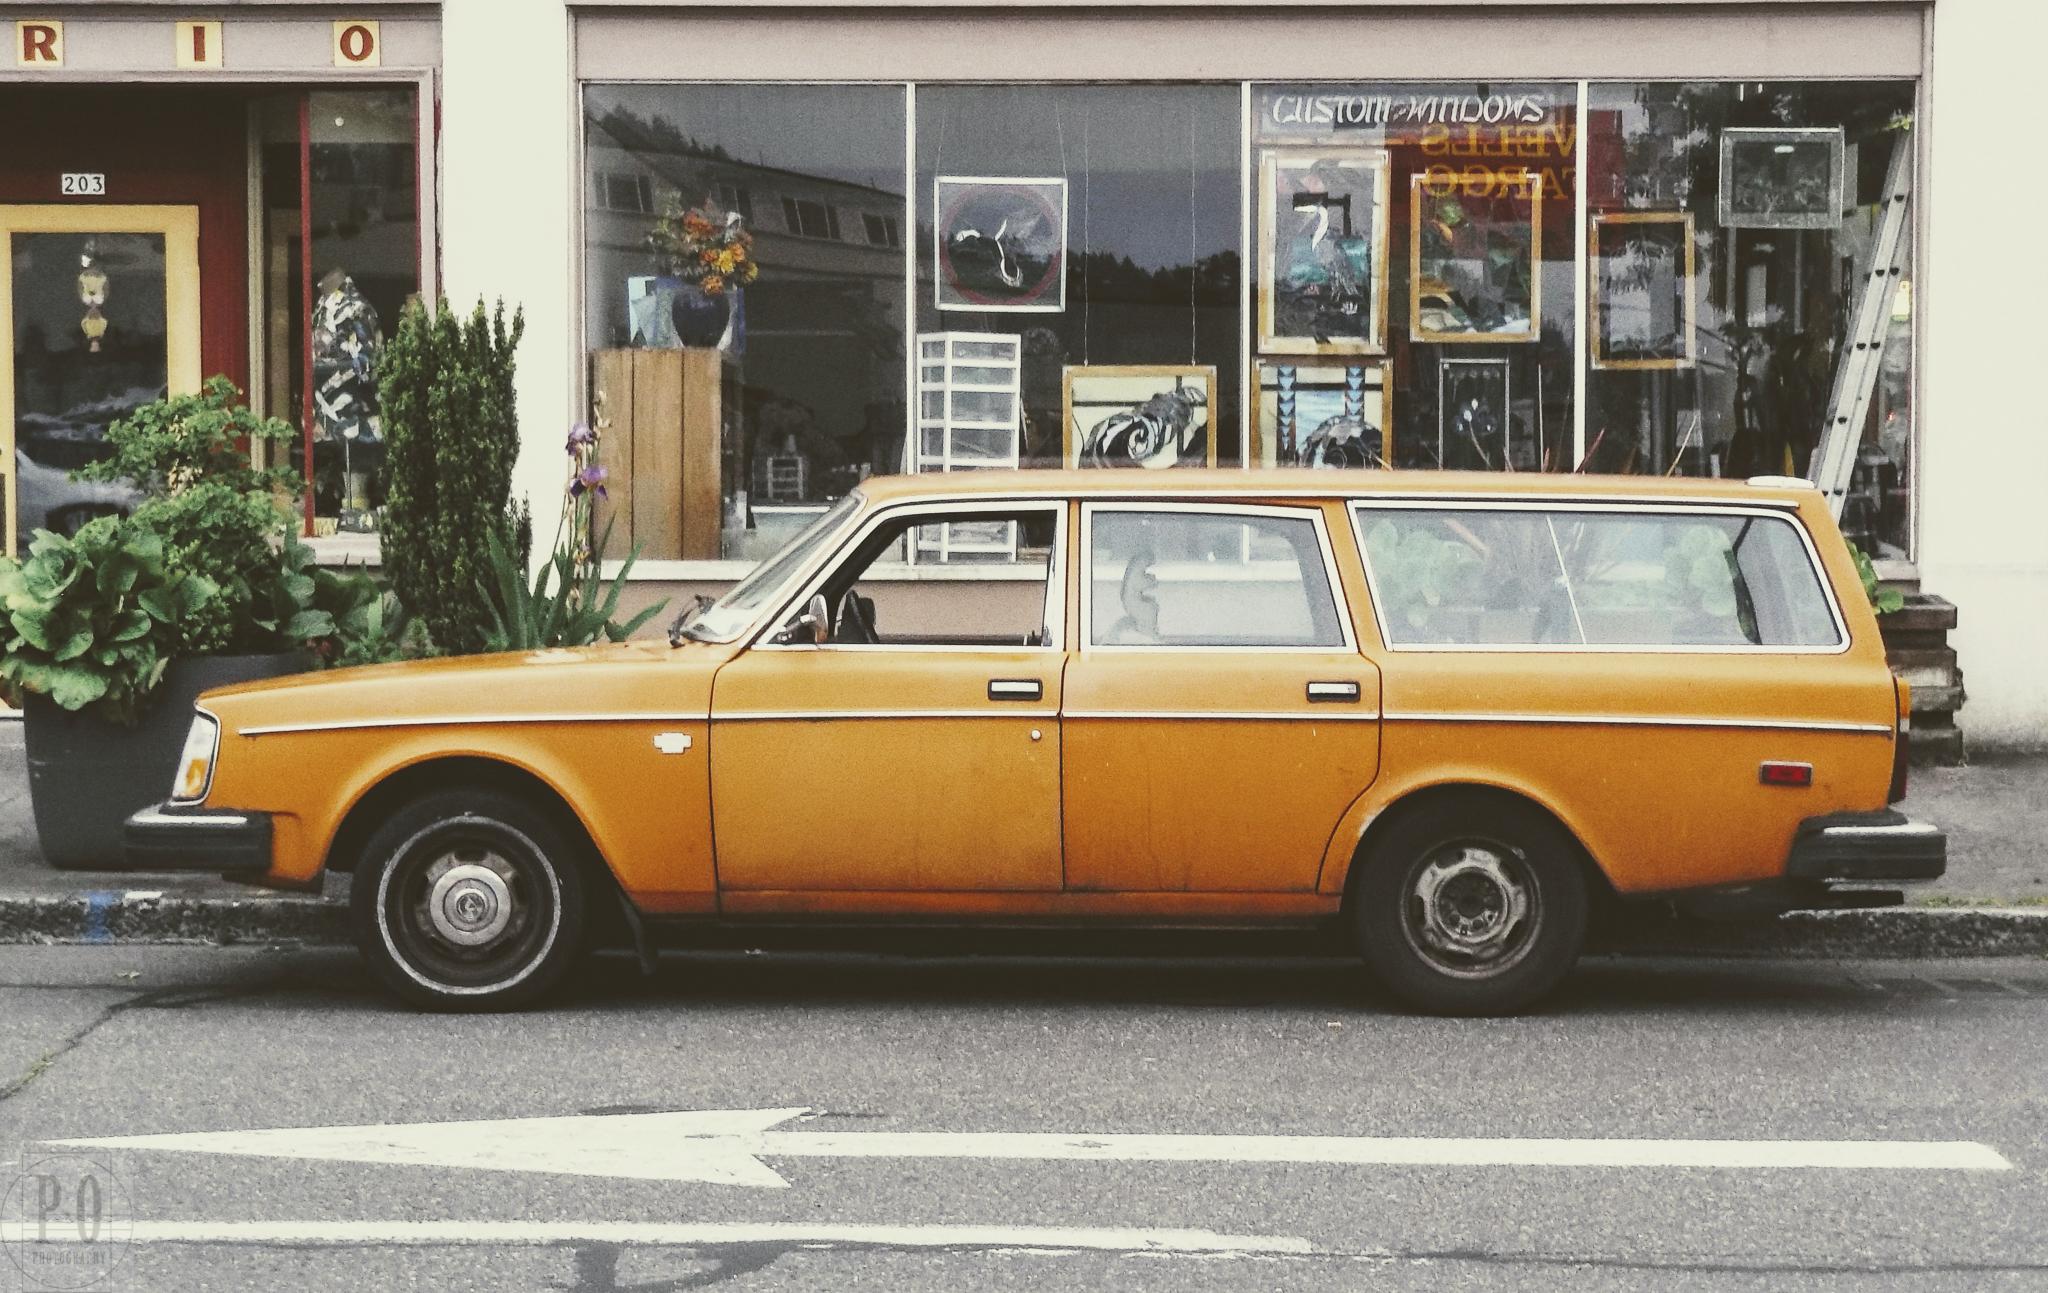 old vintage retro orange volvo station wagon image